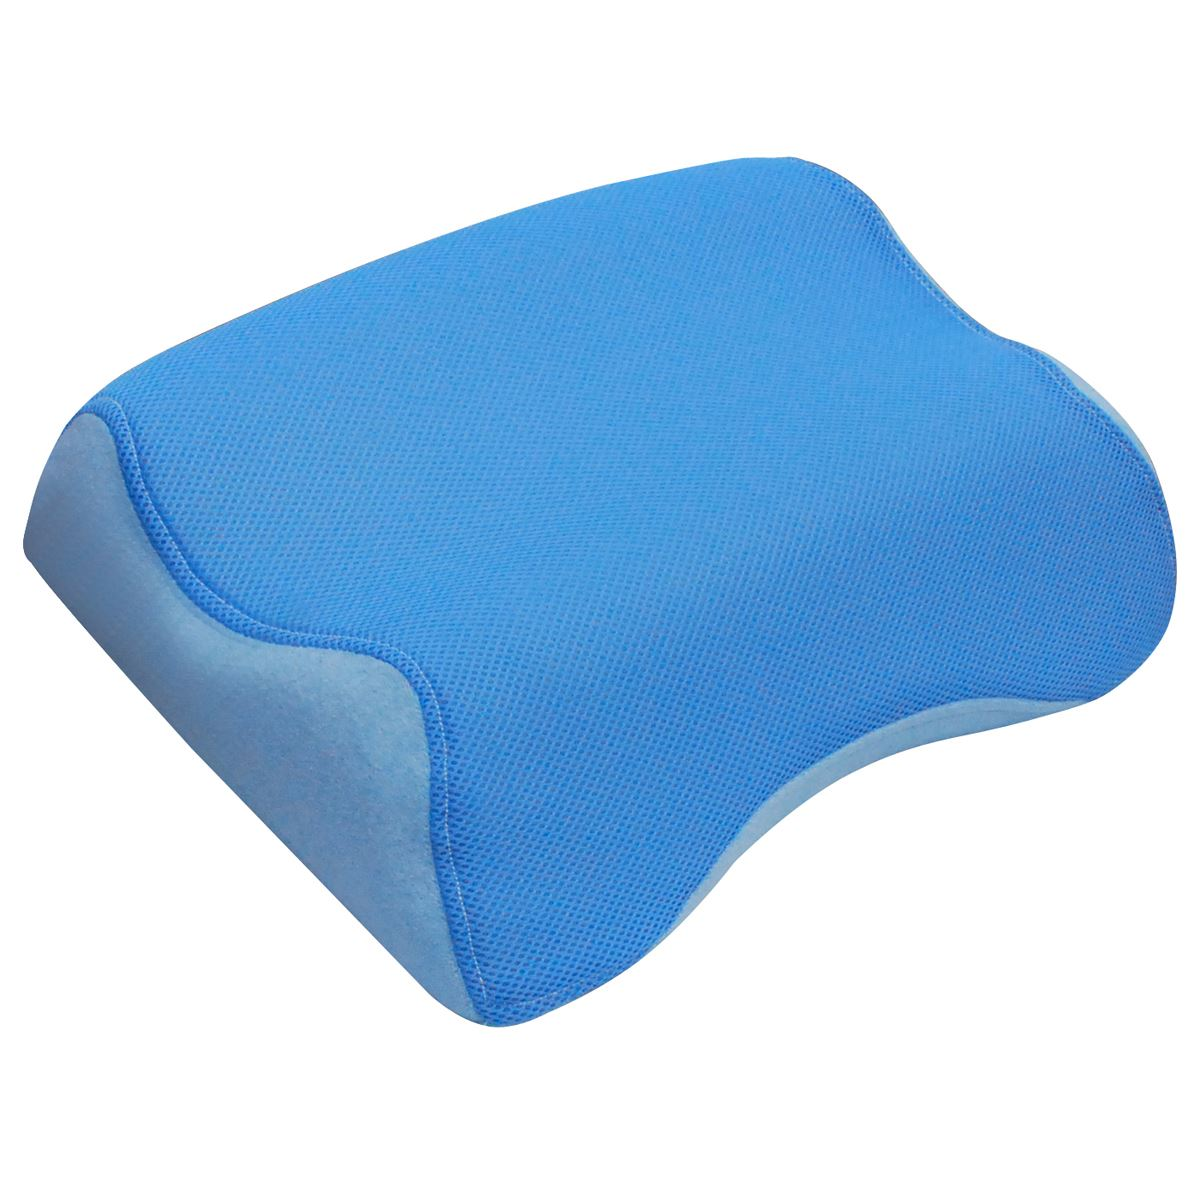 Almohada benesta antiestres  - Sanborns